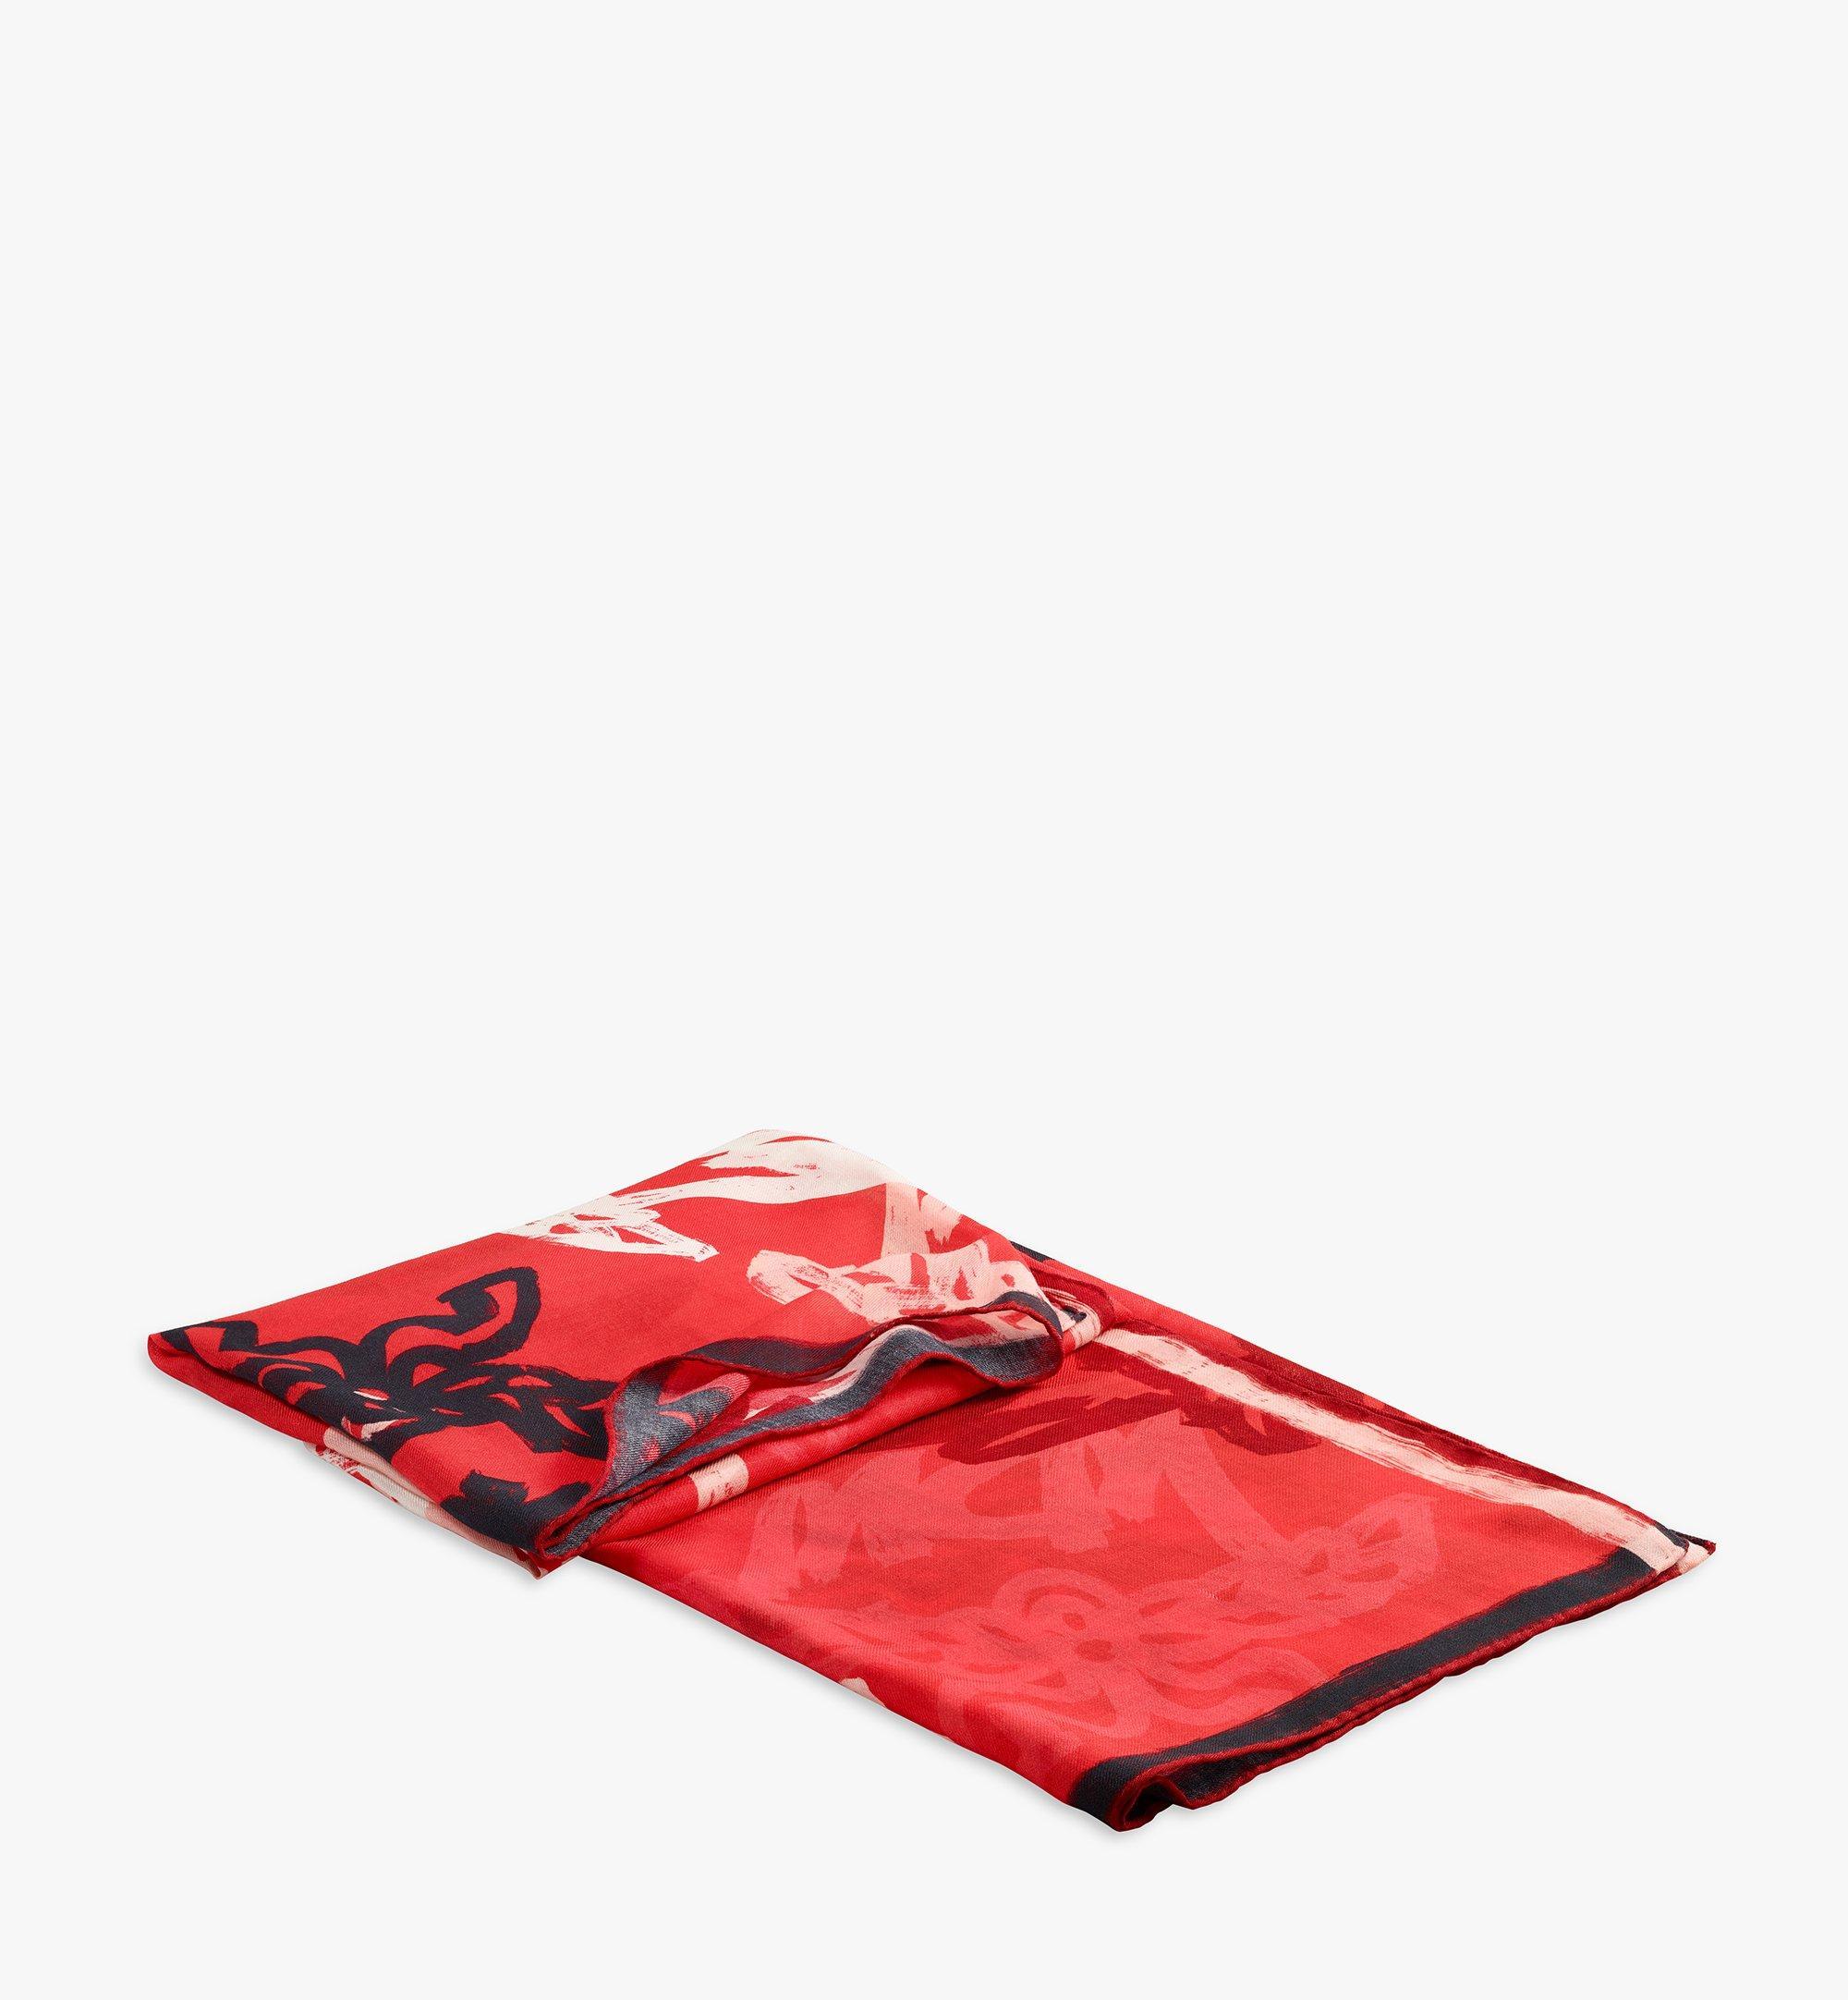 MCM Abstract Monogram Wool Scarf Red MEFAAMM02RP001 Alternate View 2